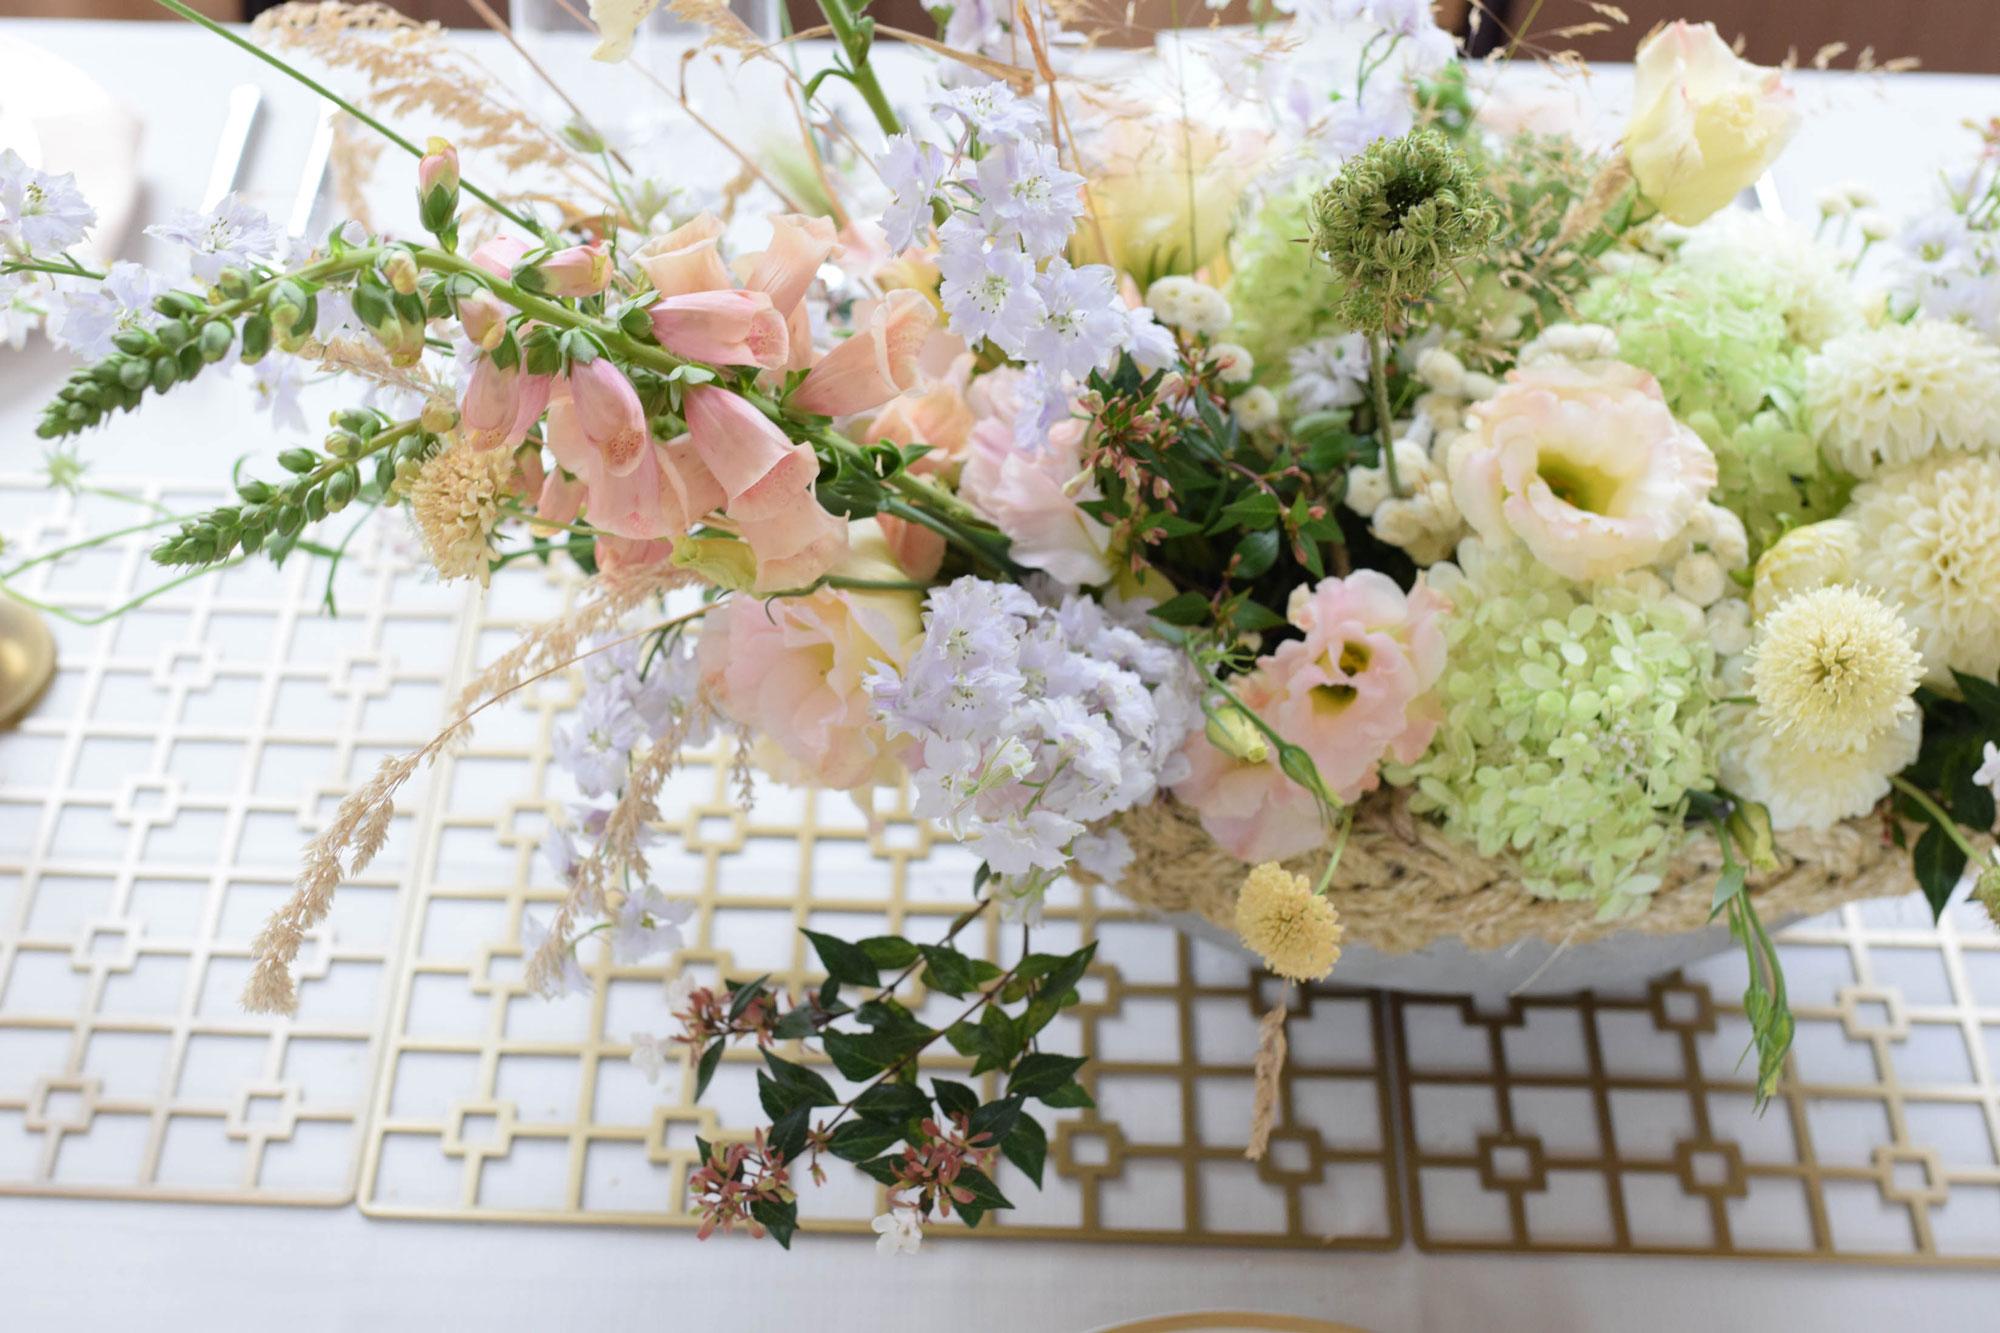 BBJ-Photoshoot-Curious-Lola--Flowers-Closeup-(3)